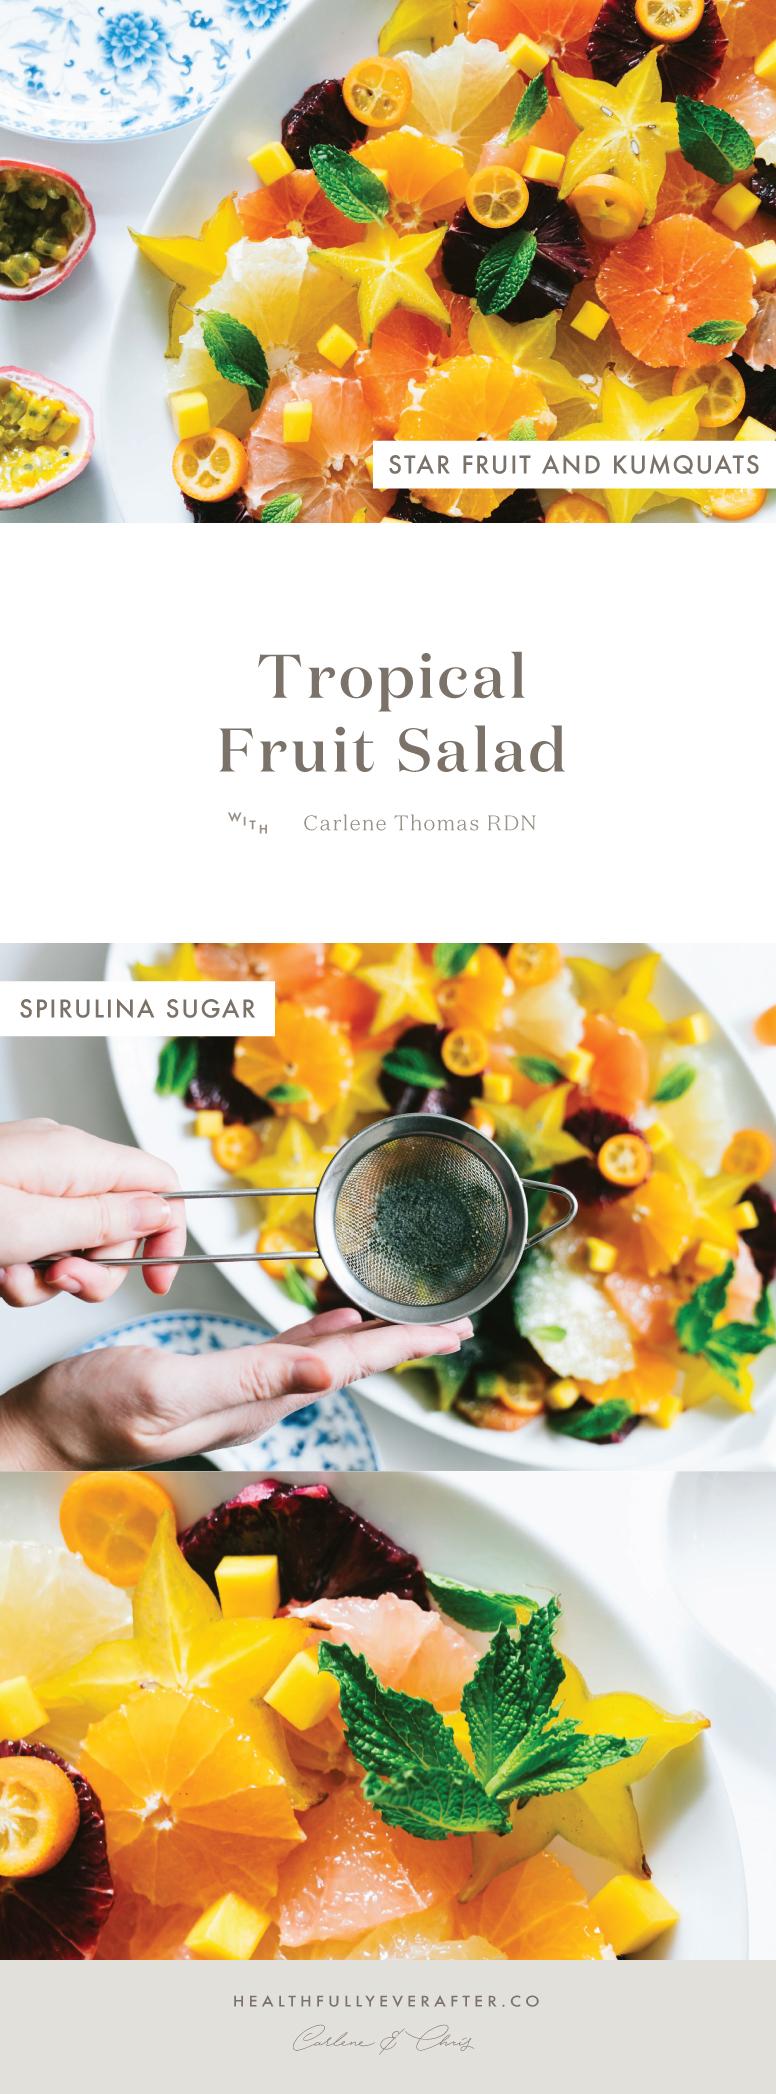 tropical fruit salad with spirulina sugar